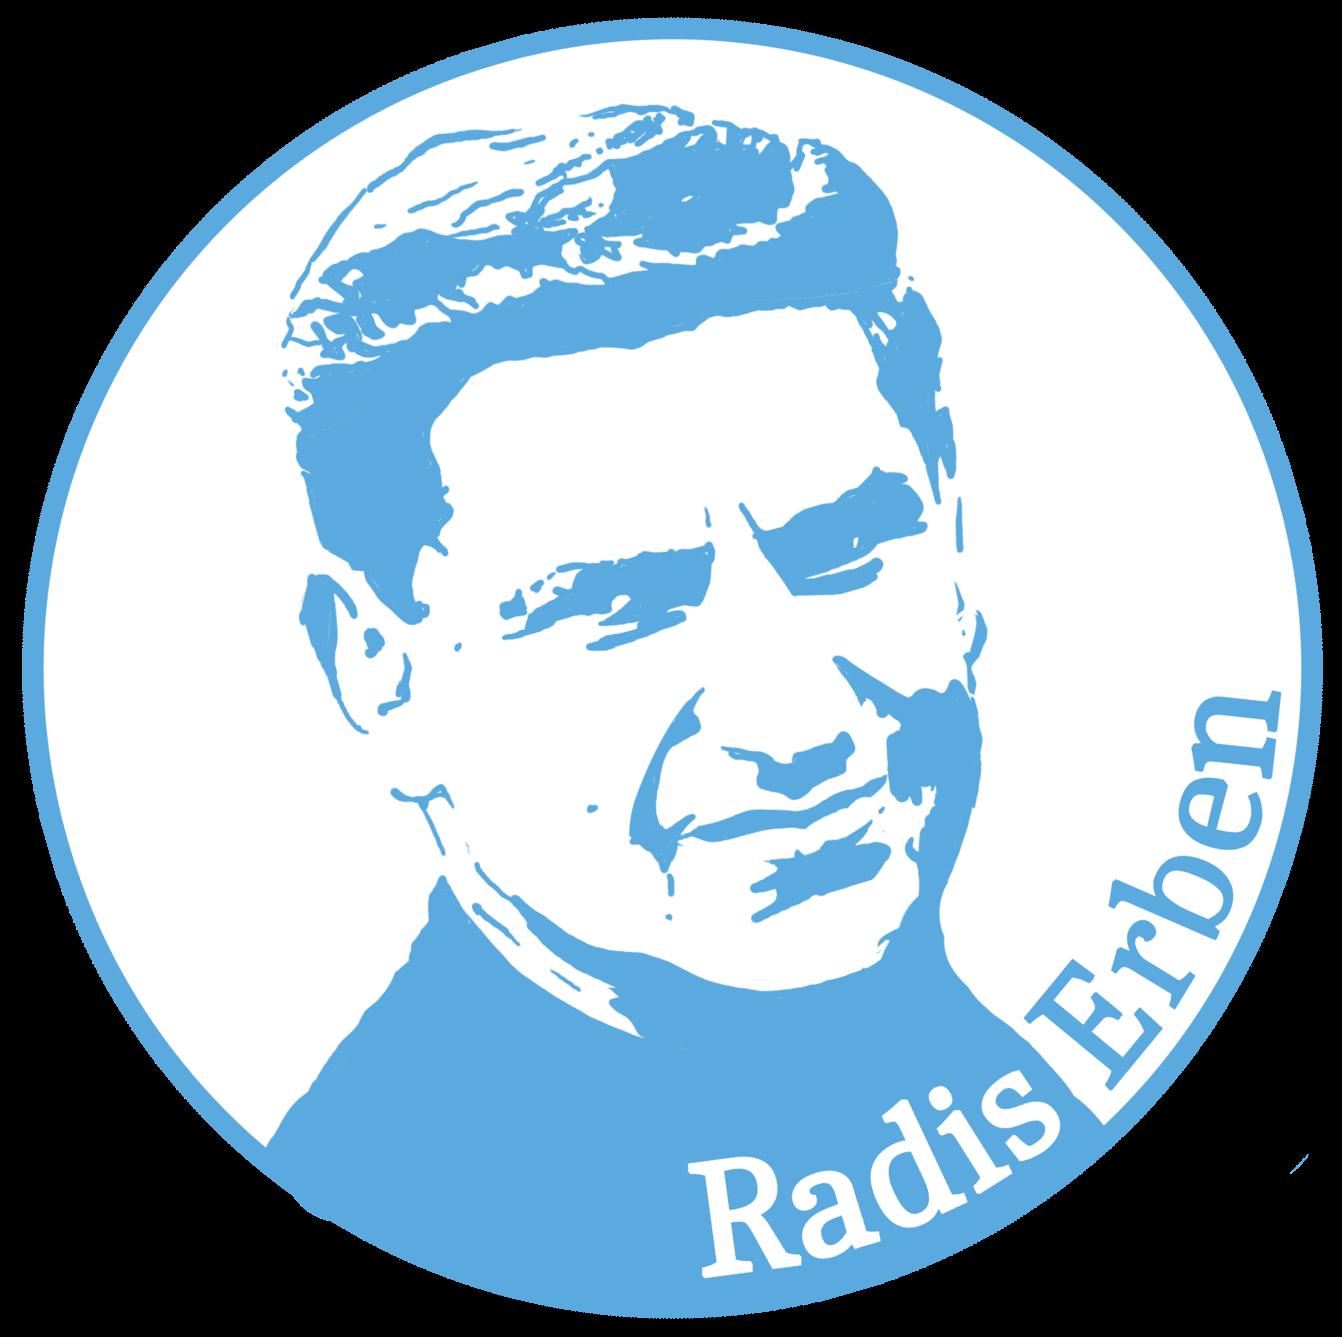 Radis Erben